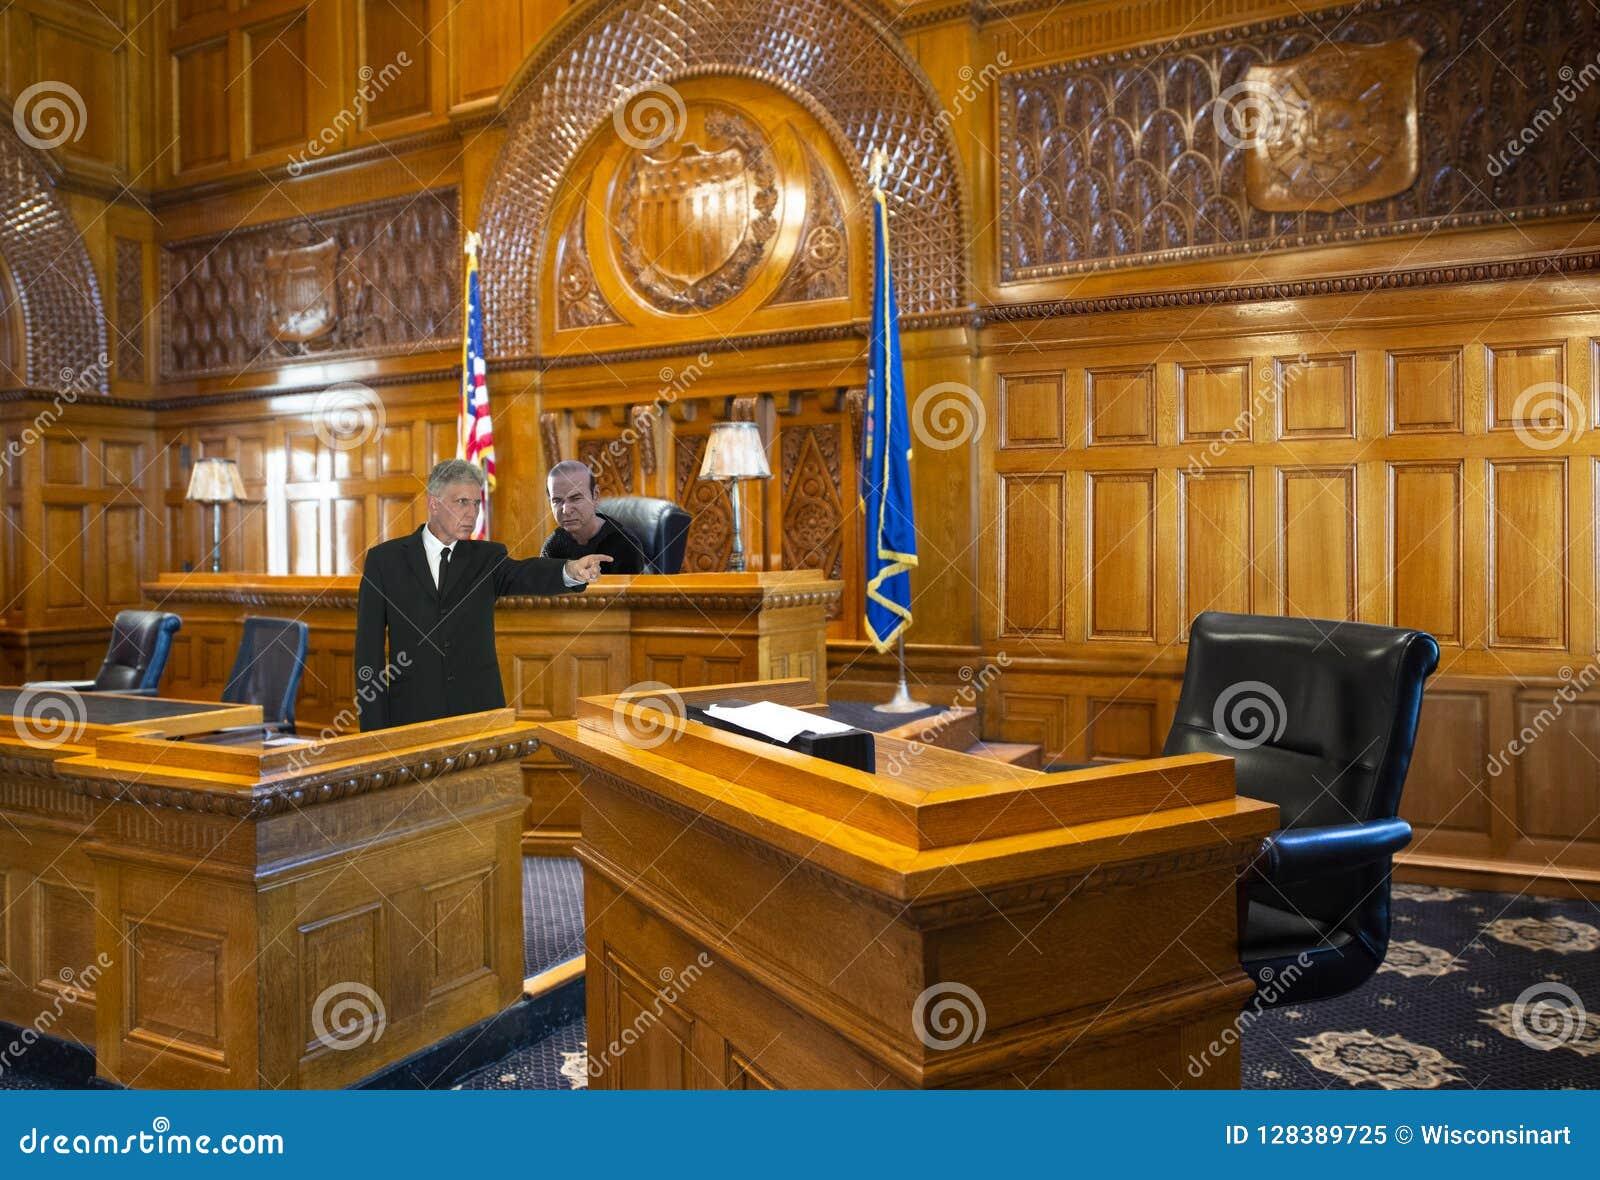 Rättssalmall, vittneställning, lag, advokat, domare